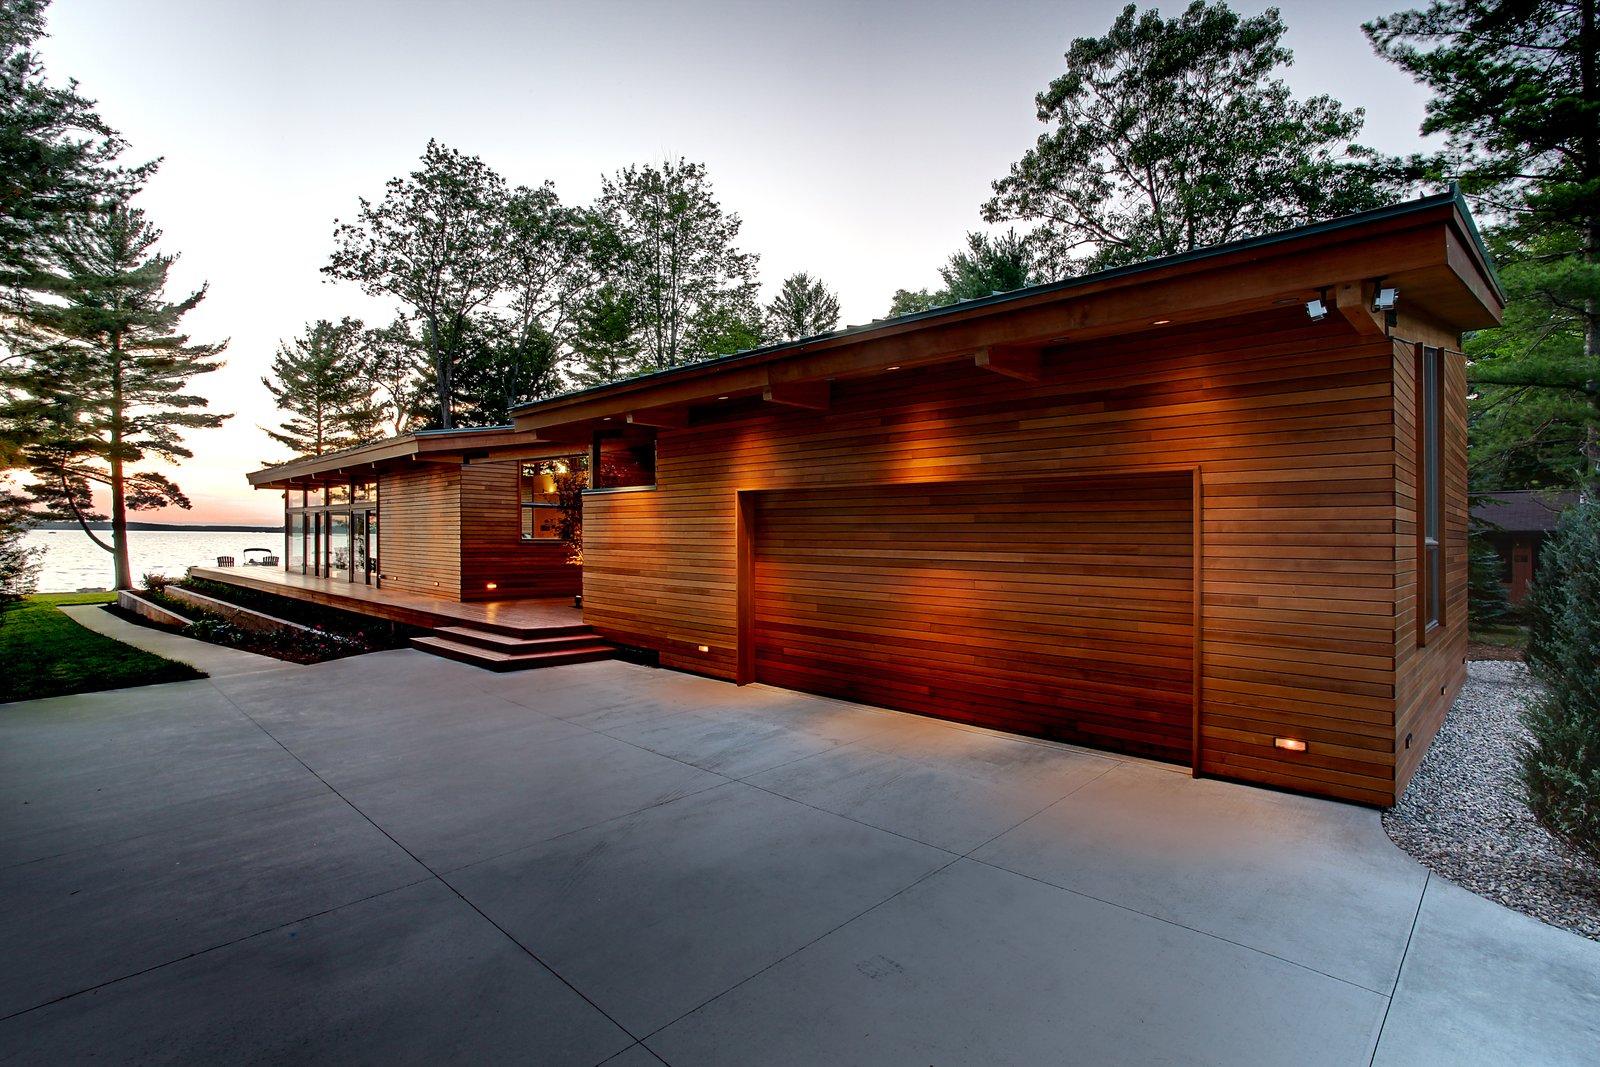 Full south side facade with cedar clad garage door  Higgins Lake House by Jeff Jordan Architects